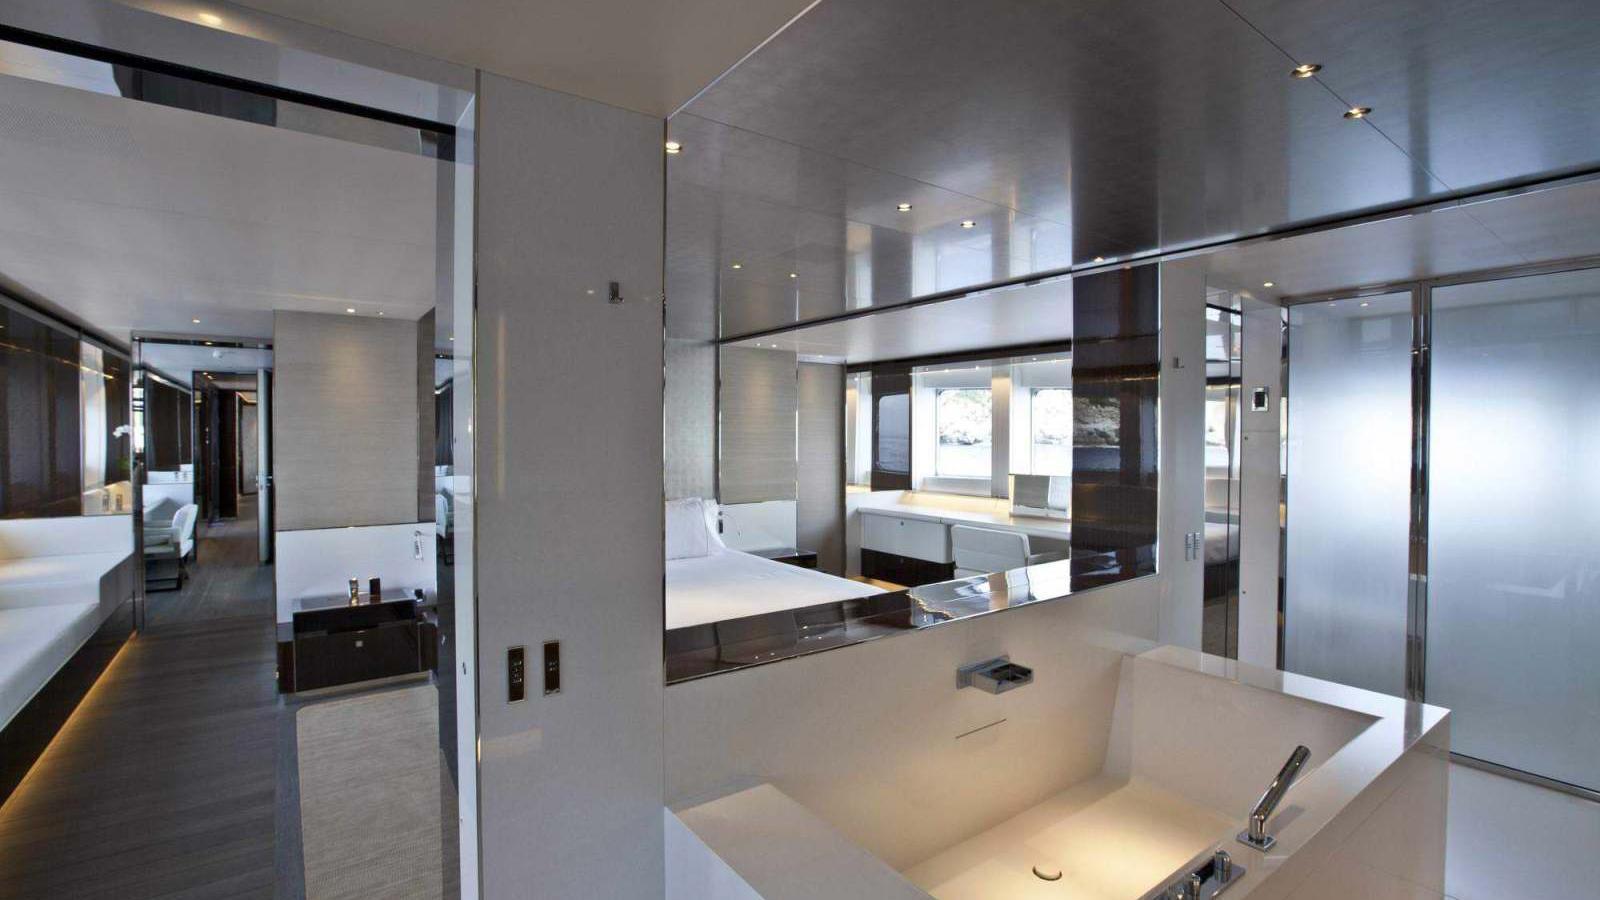 septimus-motor-yacht-heesen-2011-50m-bathroom